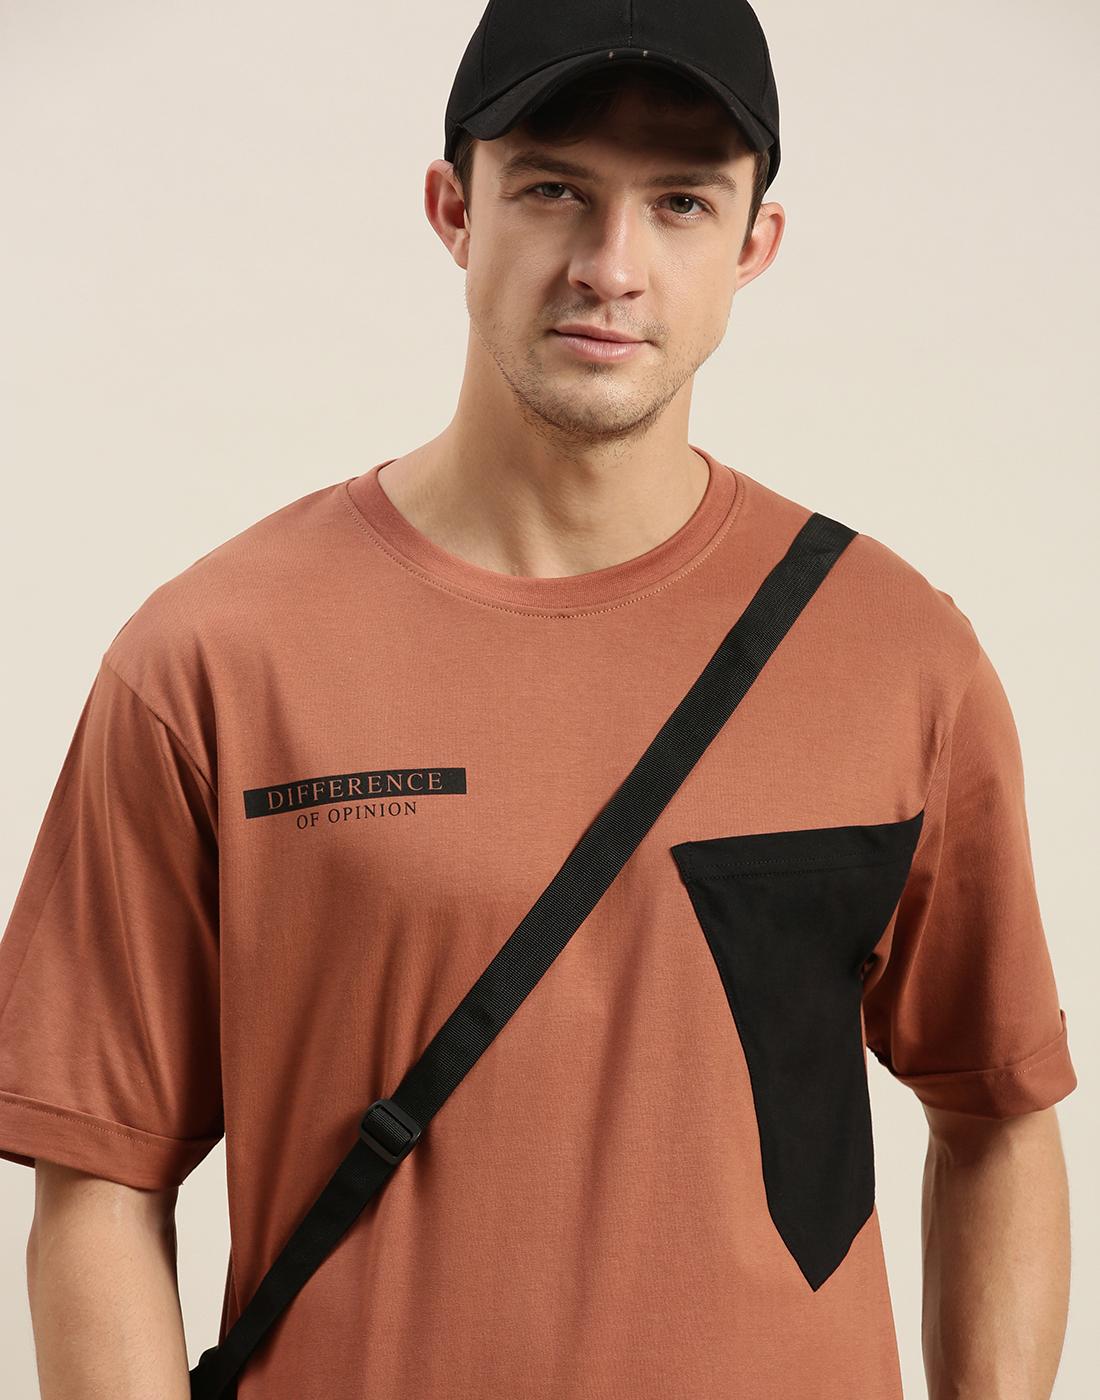 Difference of Opinion | Difference of Opinion Brown Colour-block Oversized T-Shirt